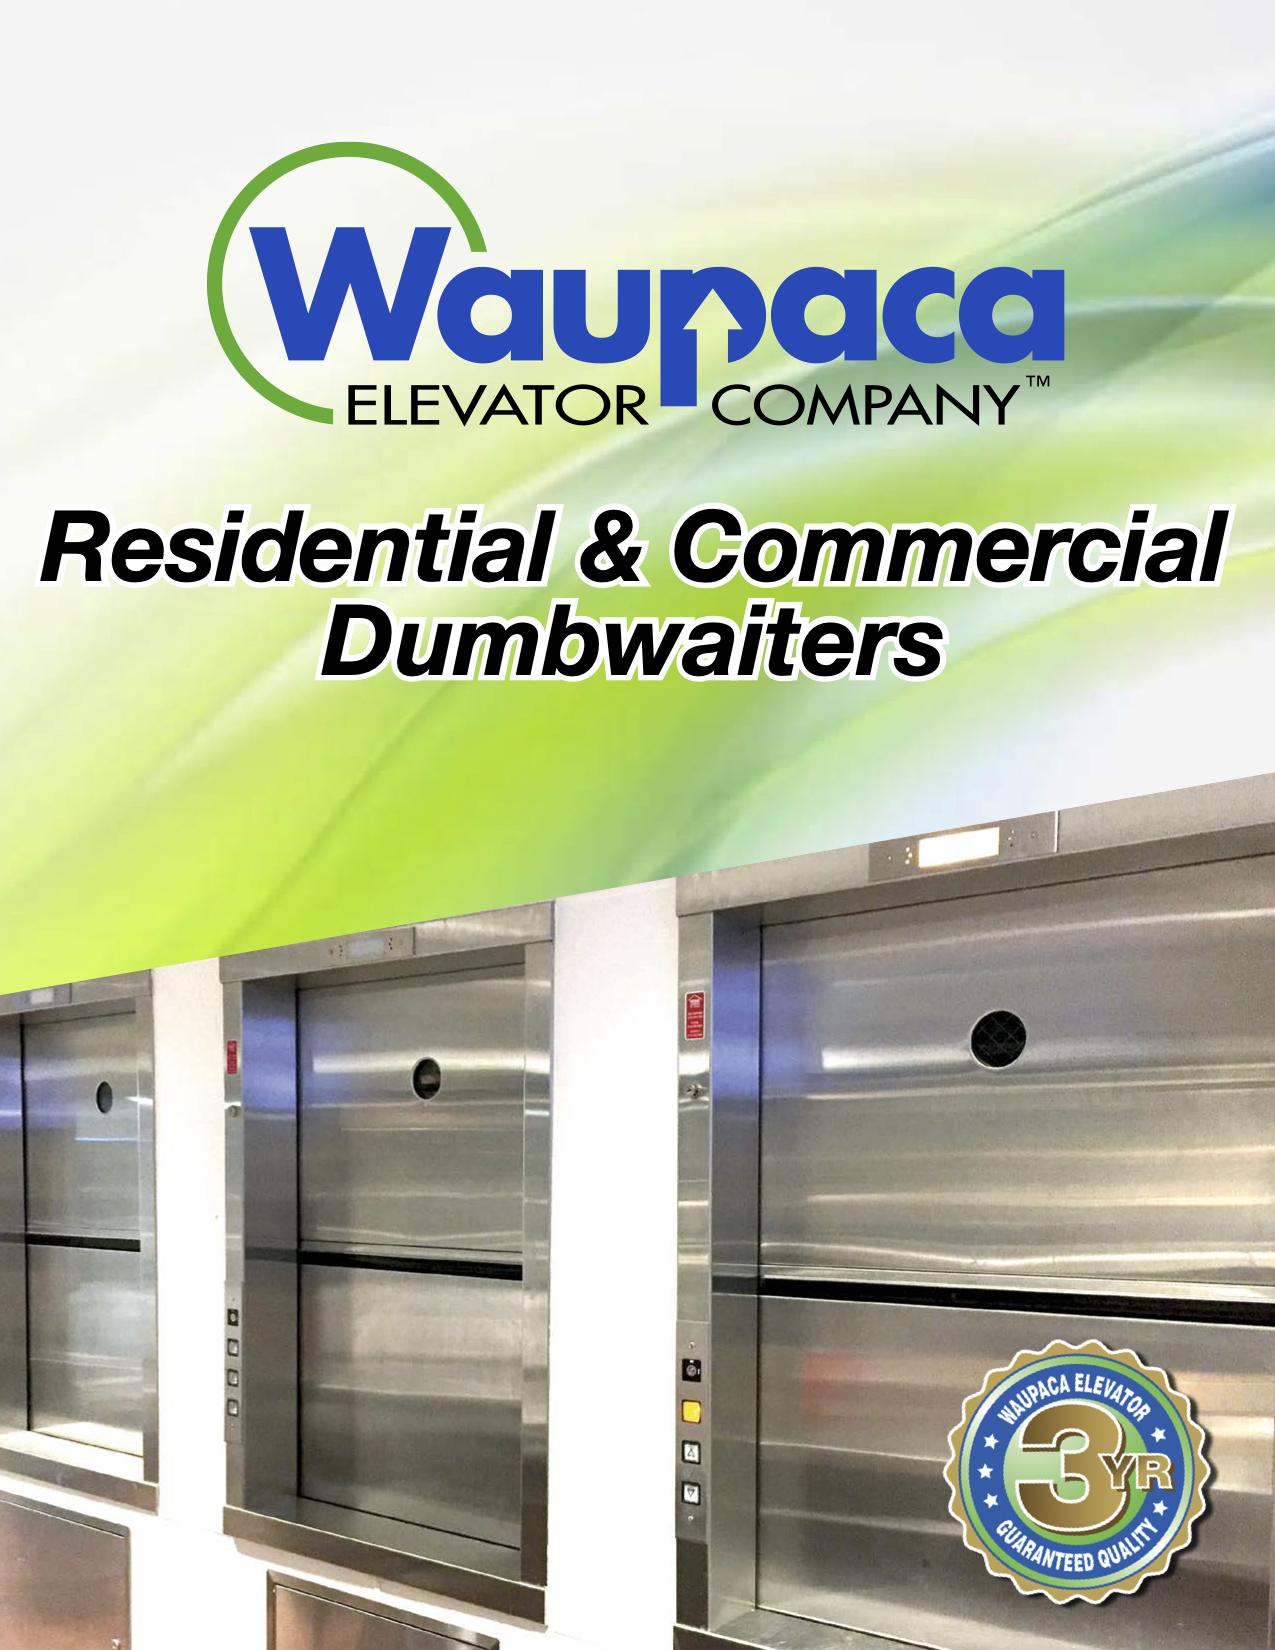 Waupaca Residential & Commercial Dumbwaiters